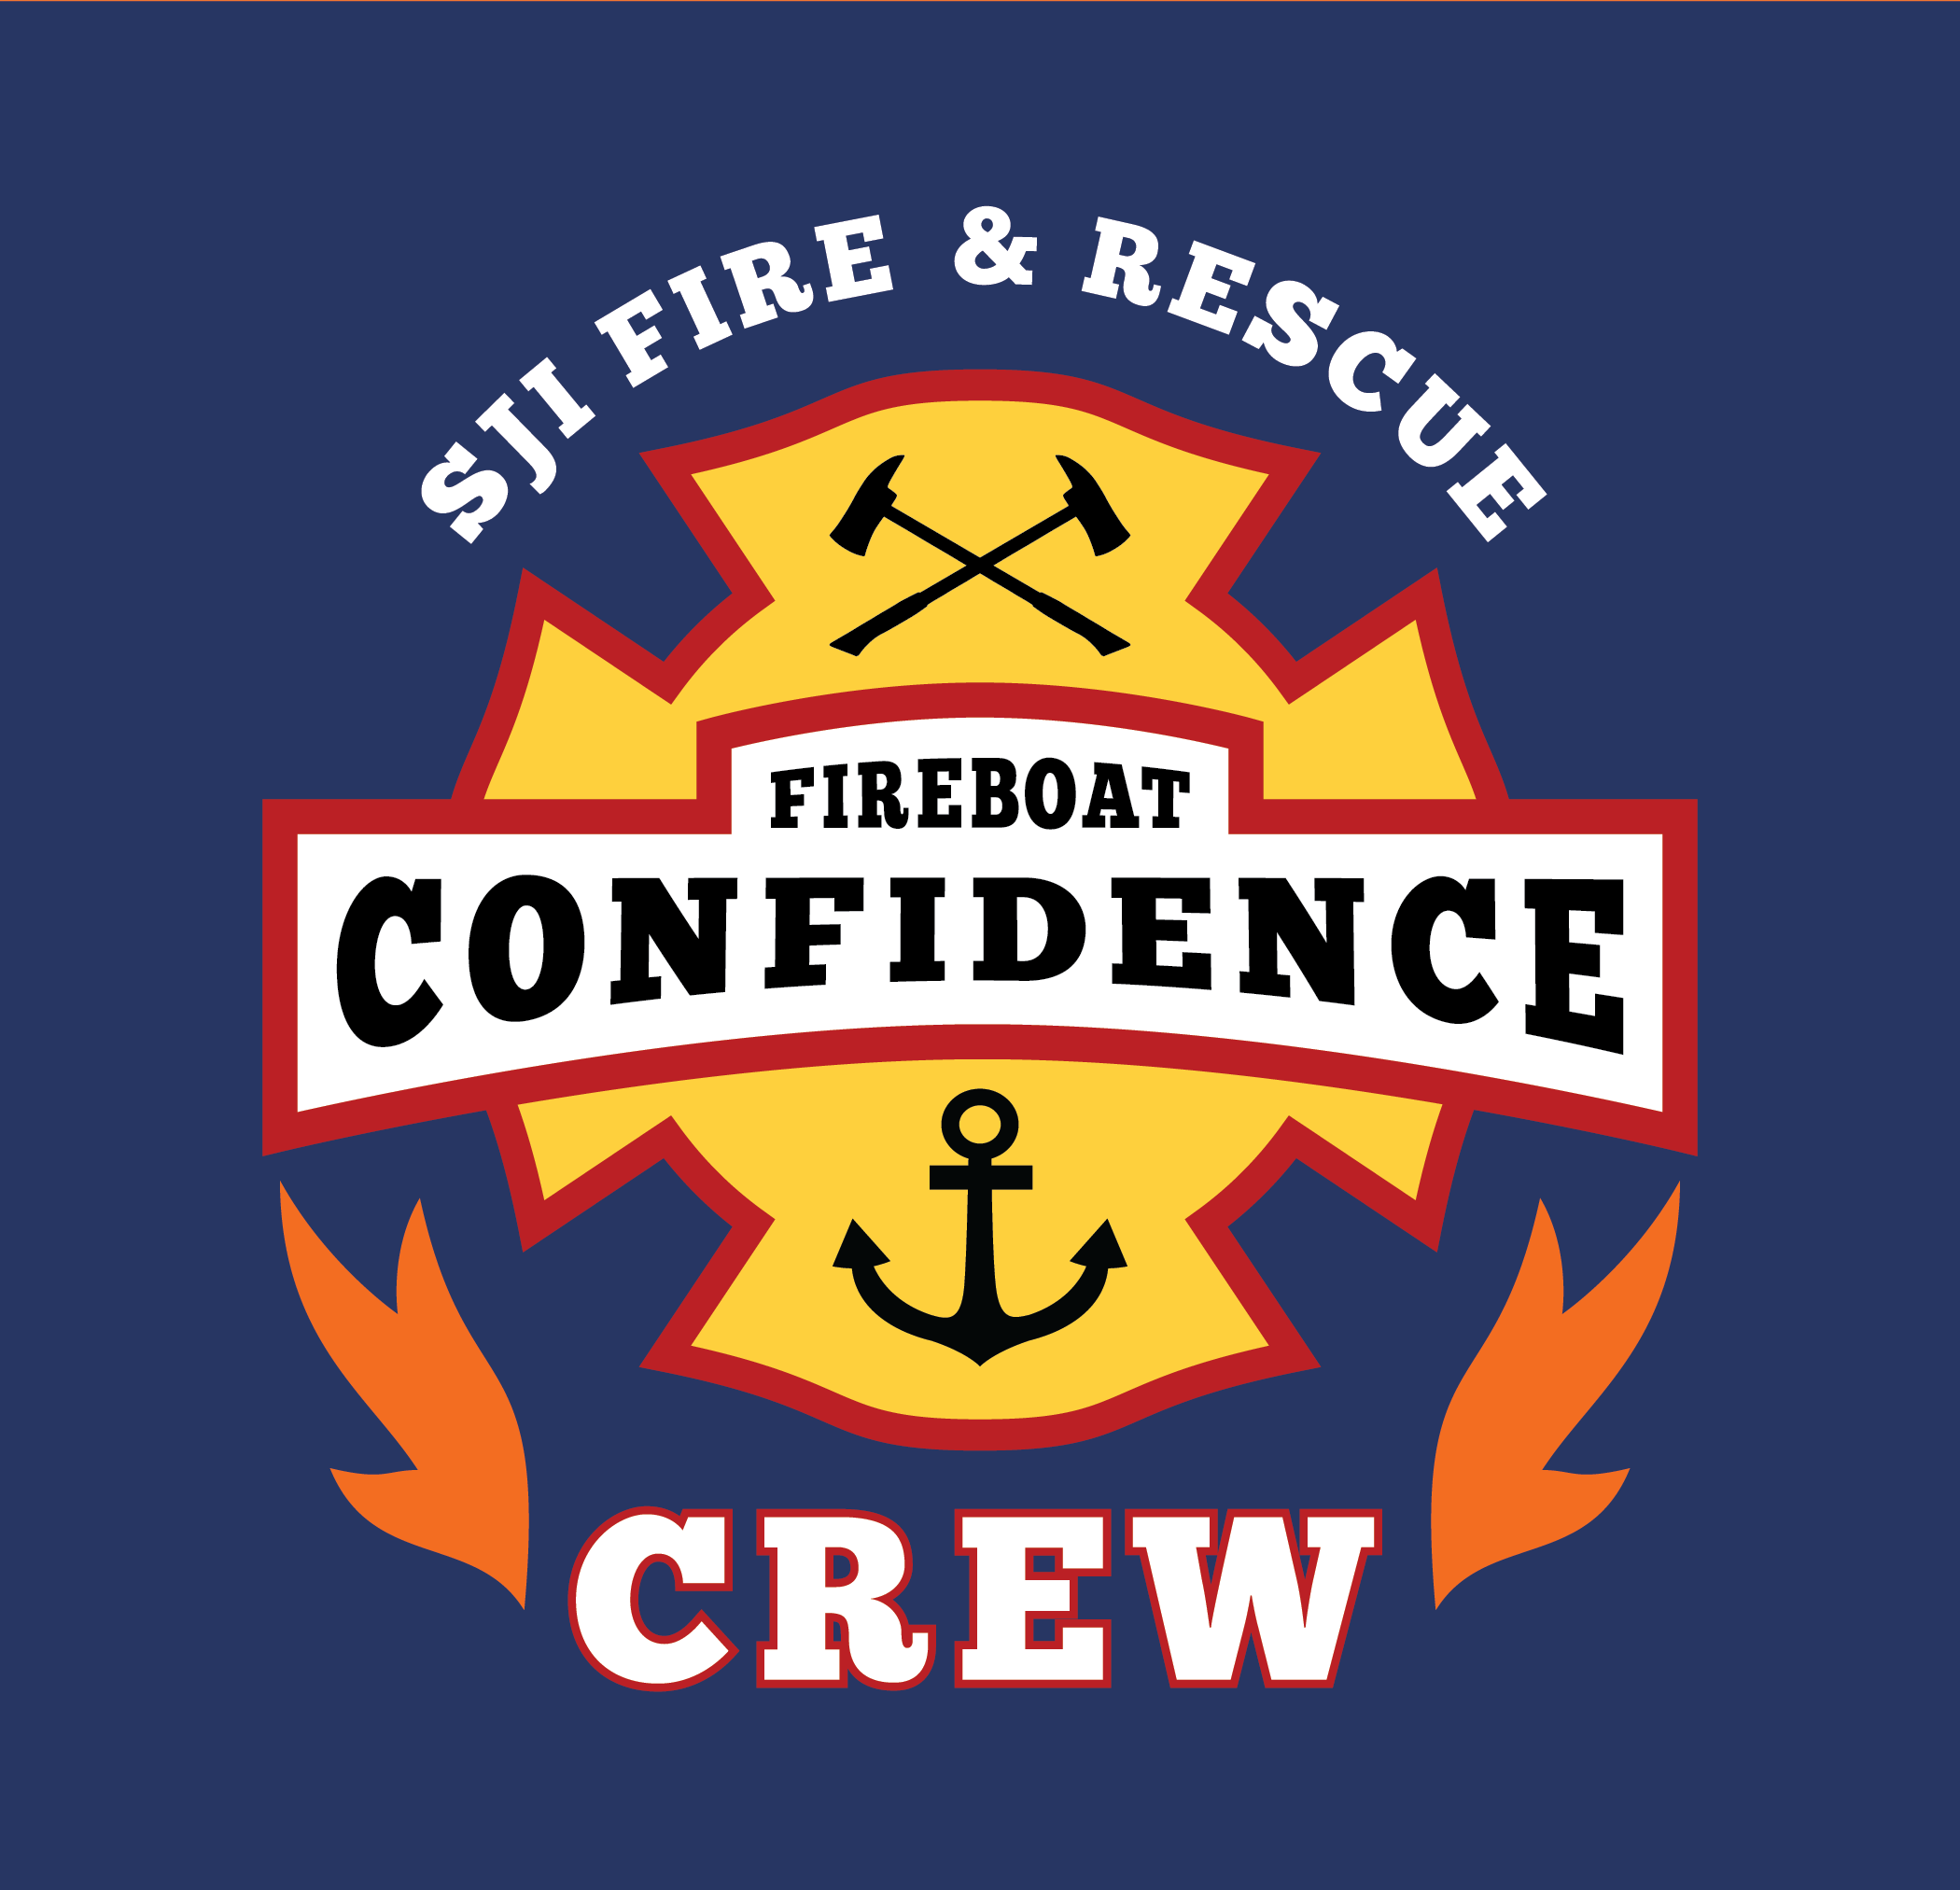 FIREBOAT CONFIDENCE (crew logo)